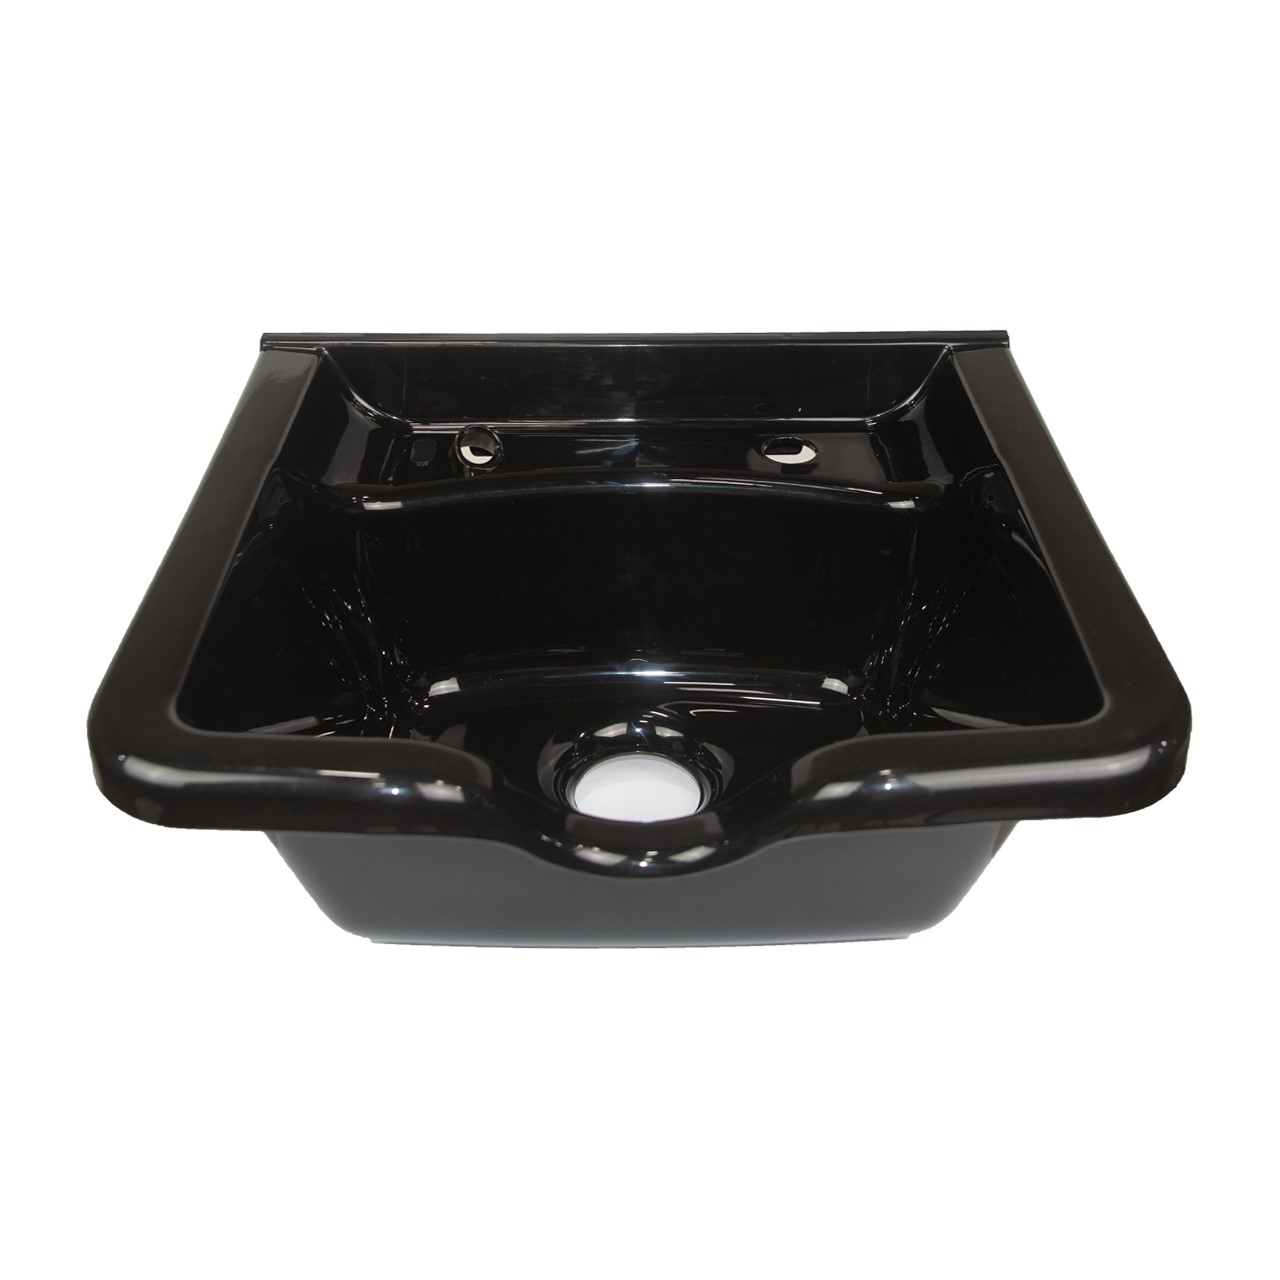 shampoo bowl kit black sink w upc cert faucet for salon spa barber shop salon equipment and furniture